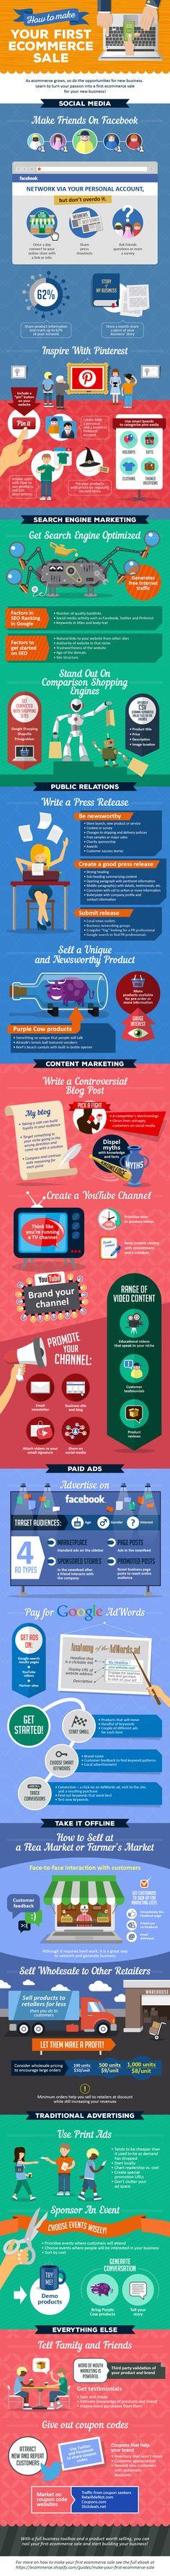 Your first E-commerce sale: #Marketing #Web #Business #Entrepreneur #Startup #Ecommerce #Content